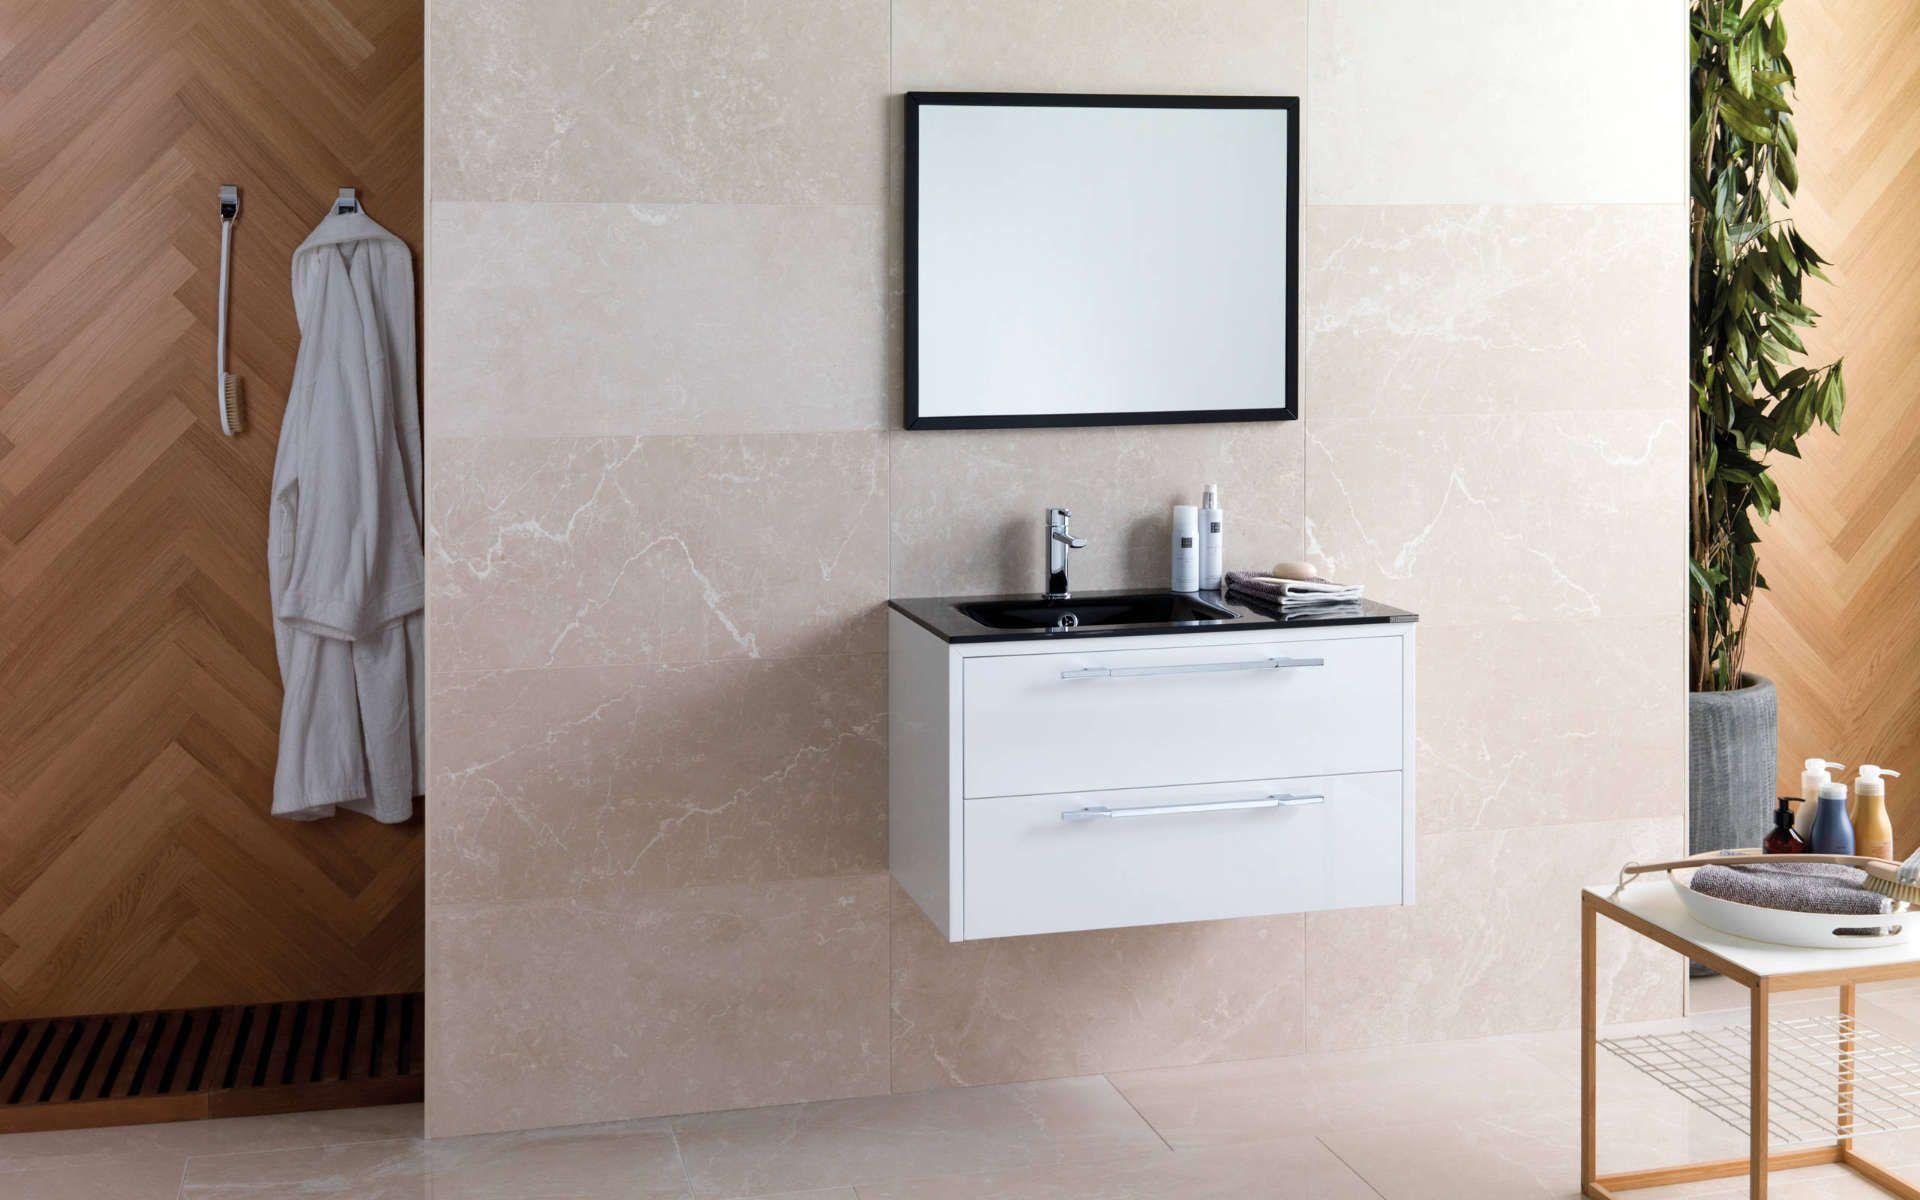 Mobilier De Salle De Bain Meubles De Salle De Bain Porcelanosa Vanity Bathroom Renovation Bathroom Vanity